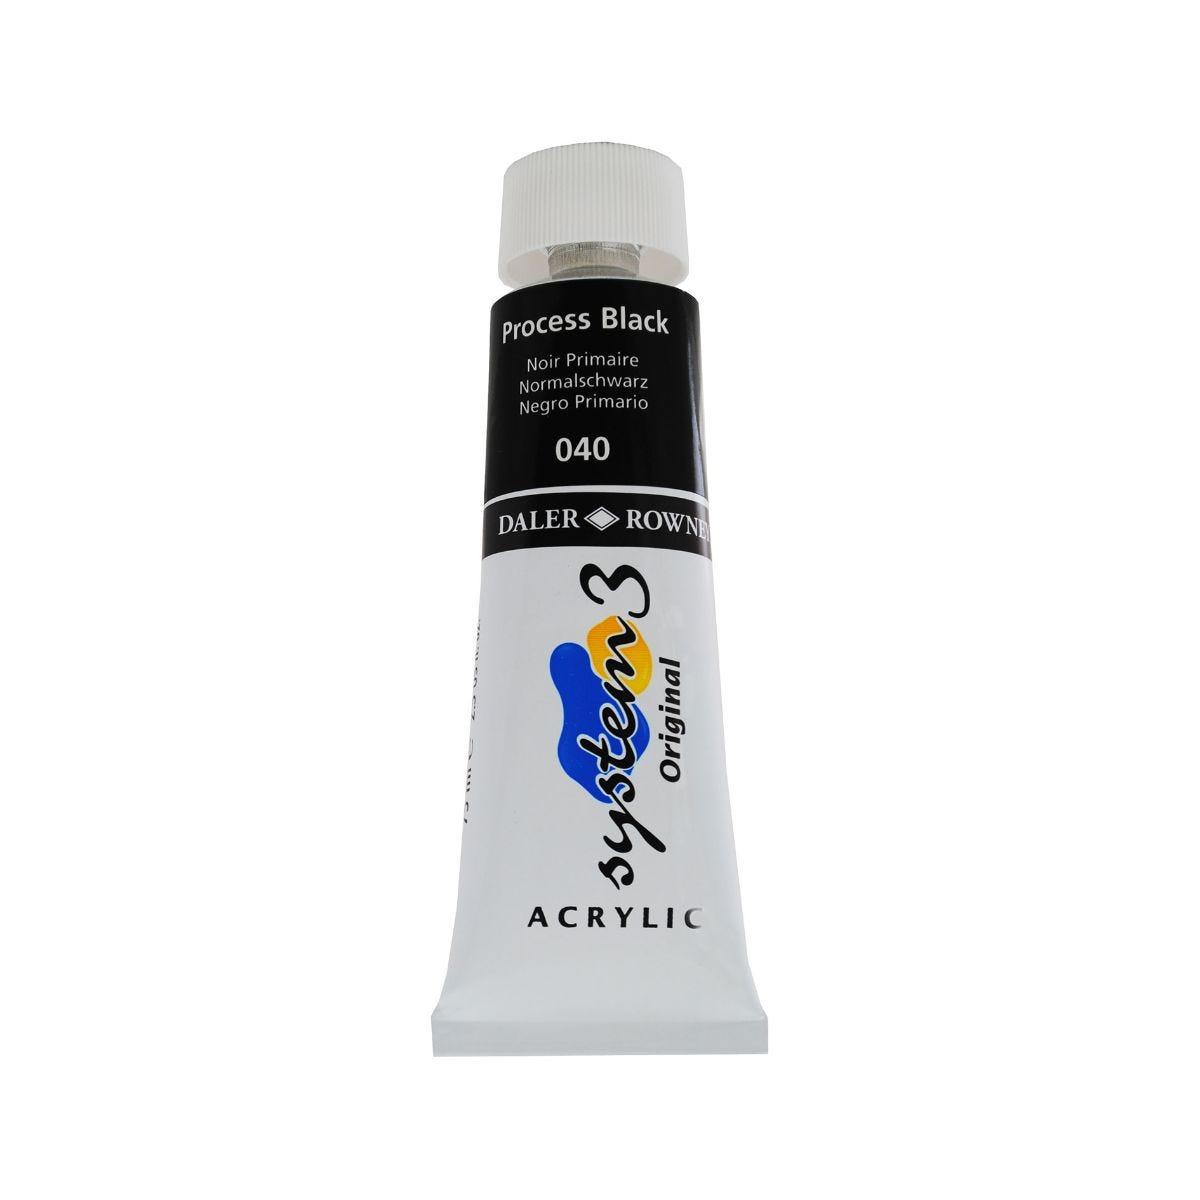 Daler Rowney System 3 Process Black Acrylic Colour 75ml, Process Black.